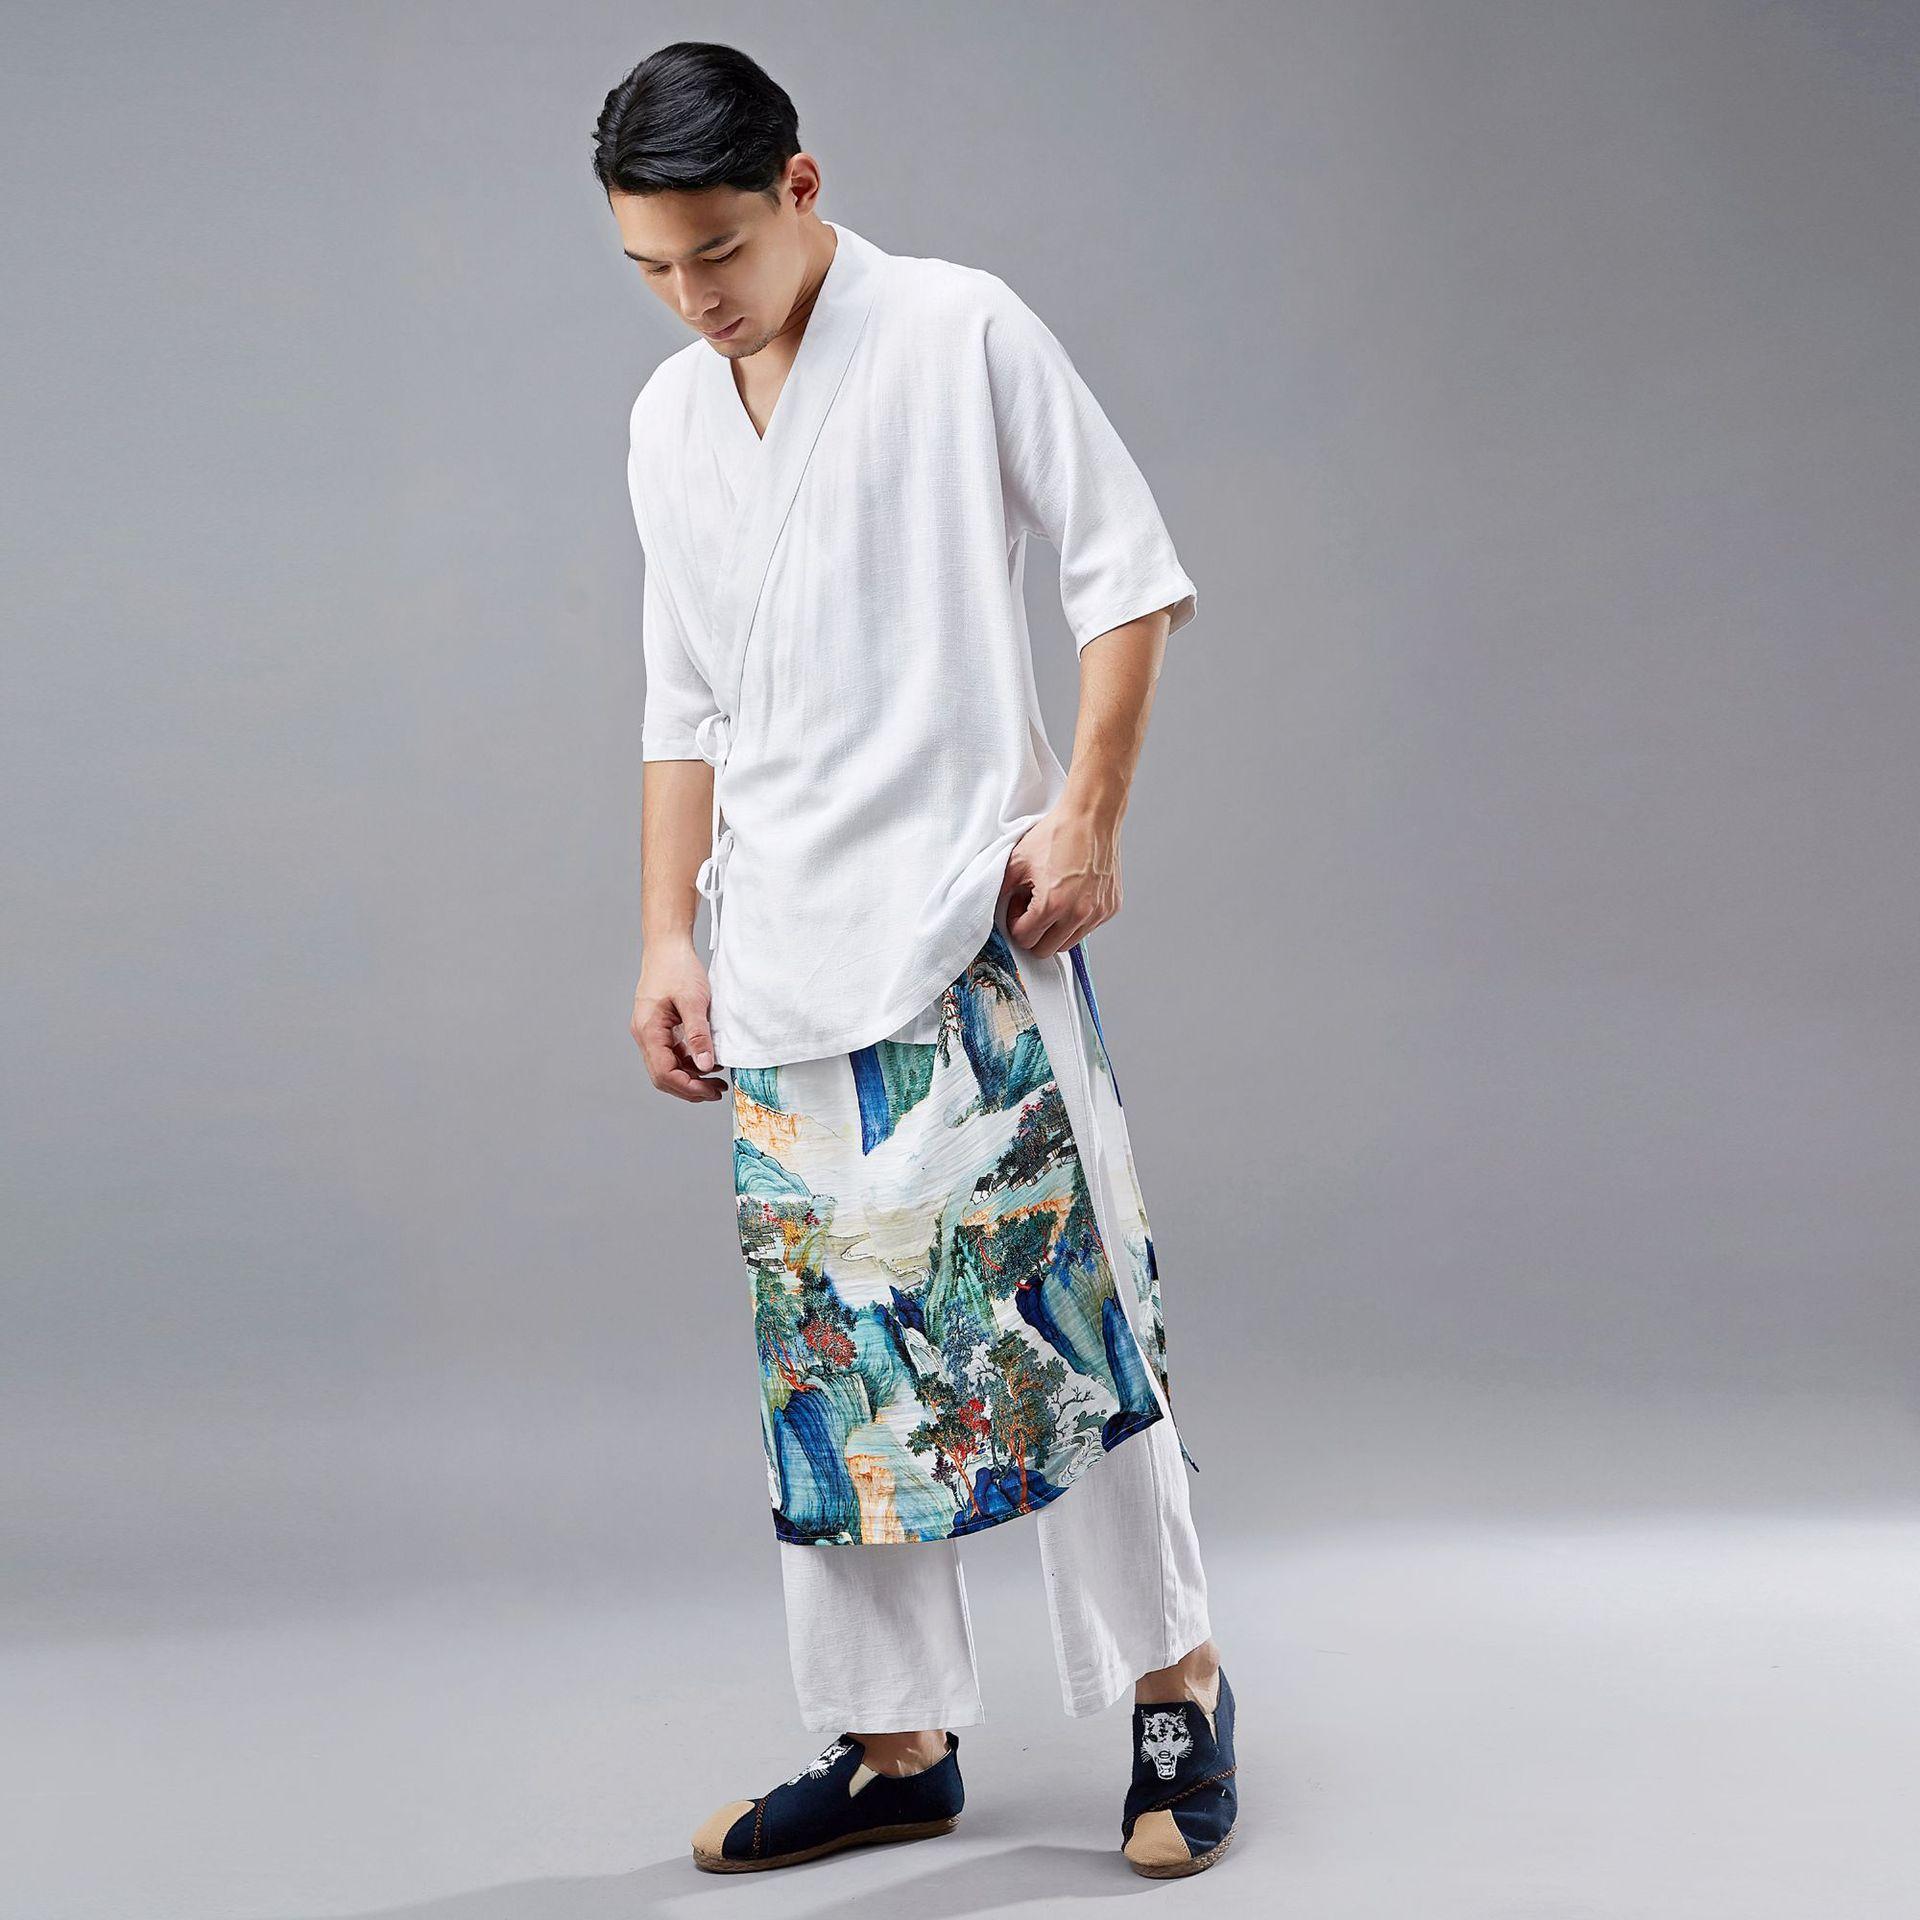 2019 New Style Hemp Cotton Casual Pants Men Chinese-style Straight-leg Pants Elastic Girdle Two-Piece Design Capri Pants